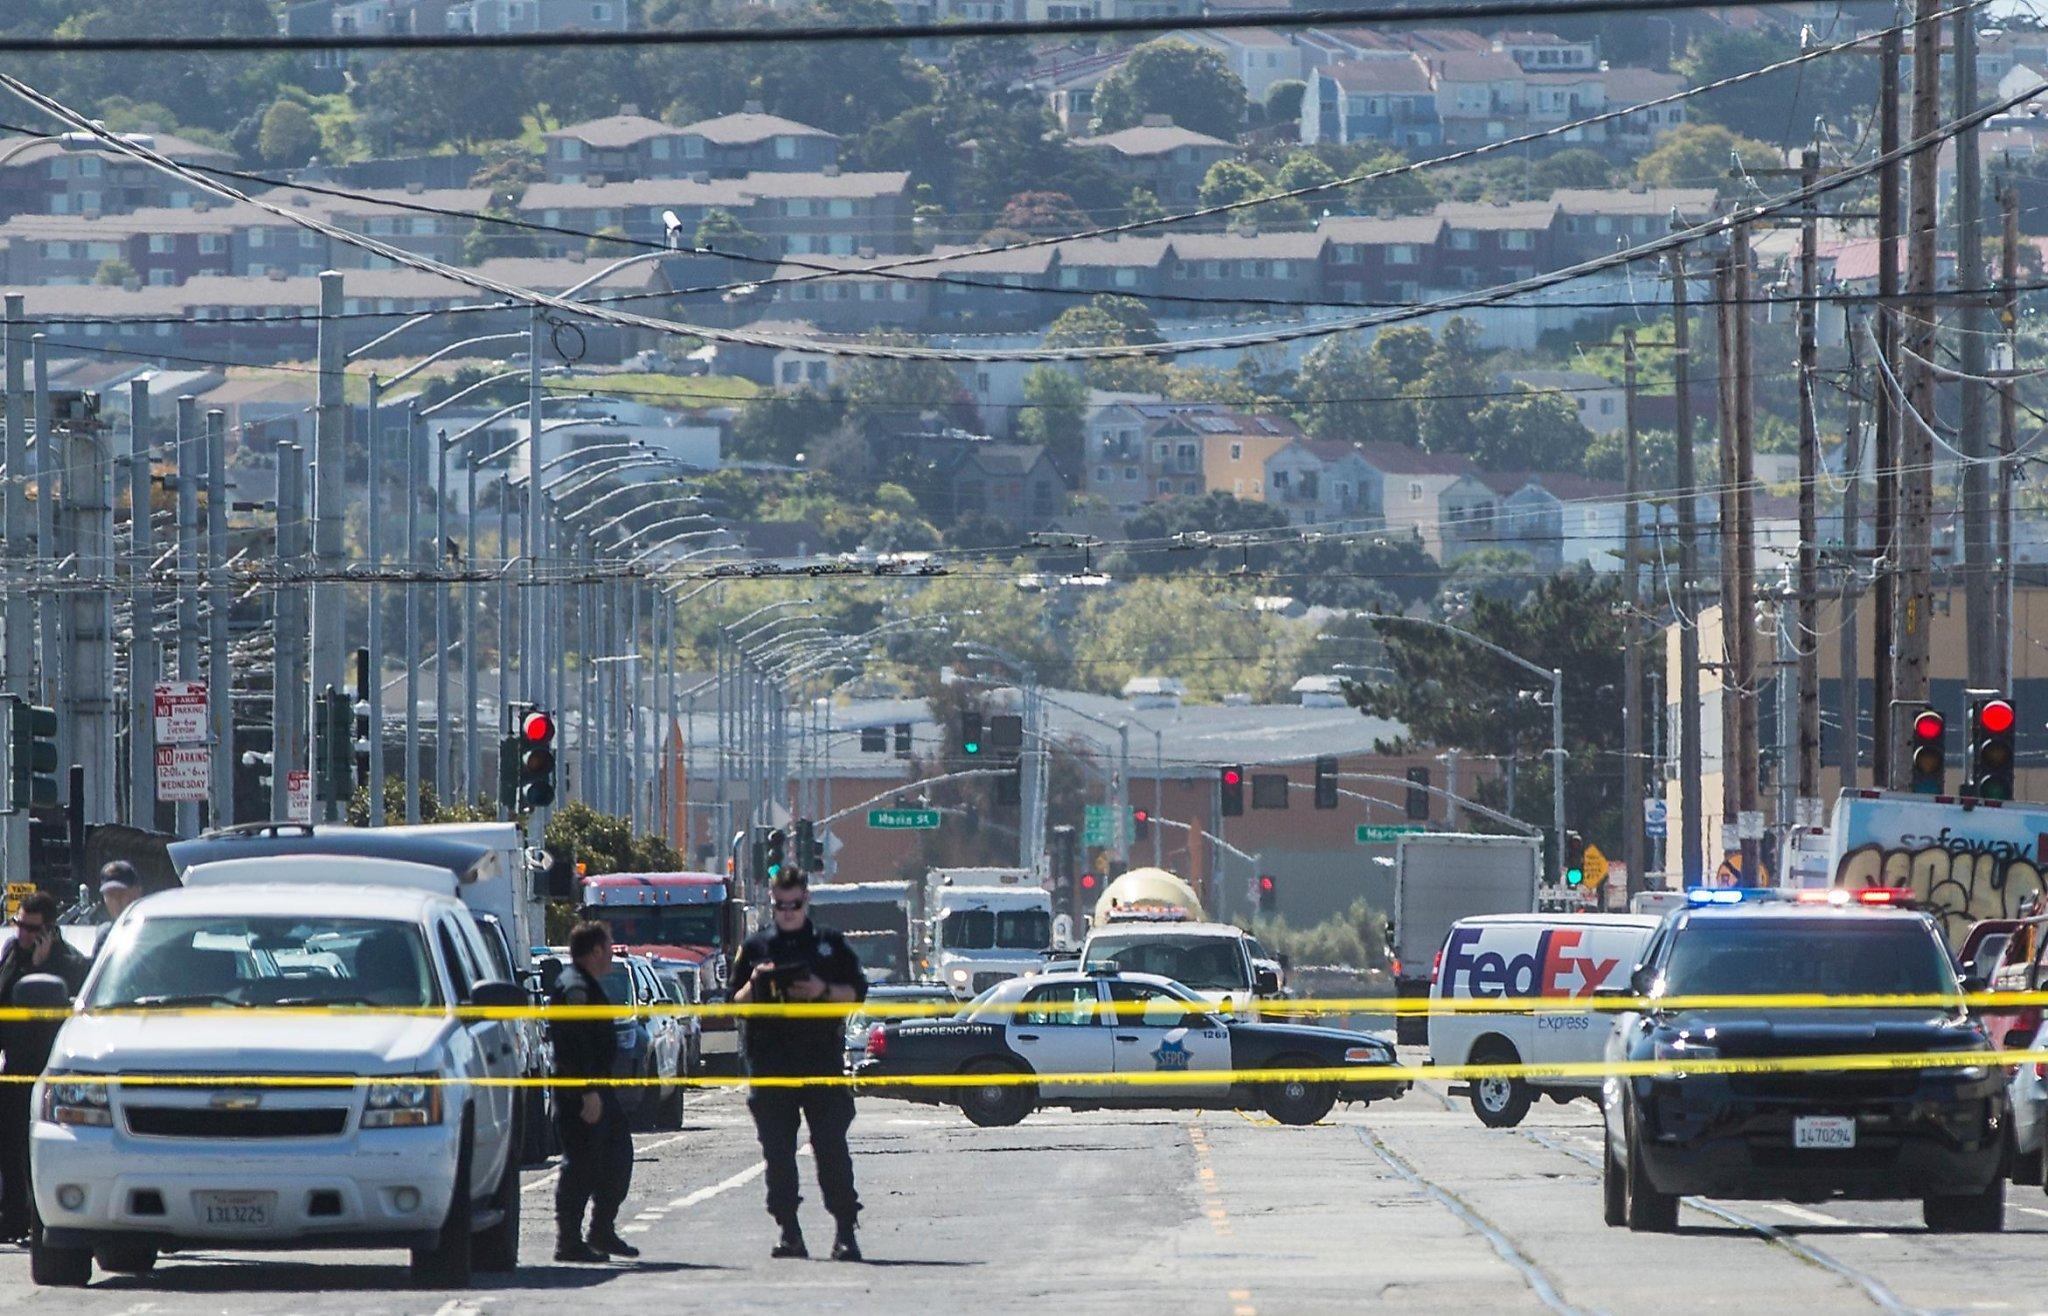 Driver mows down 5 in San Fran Developing